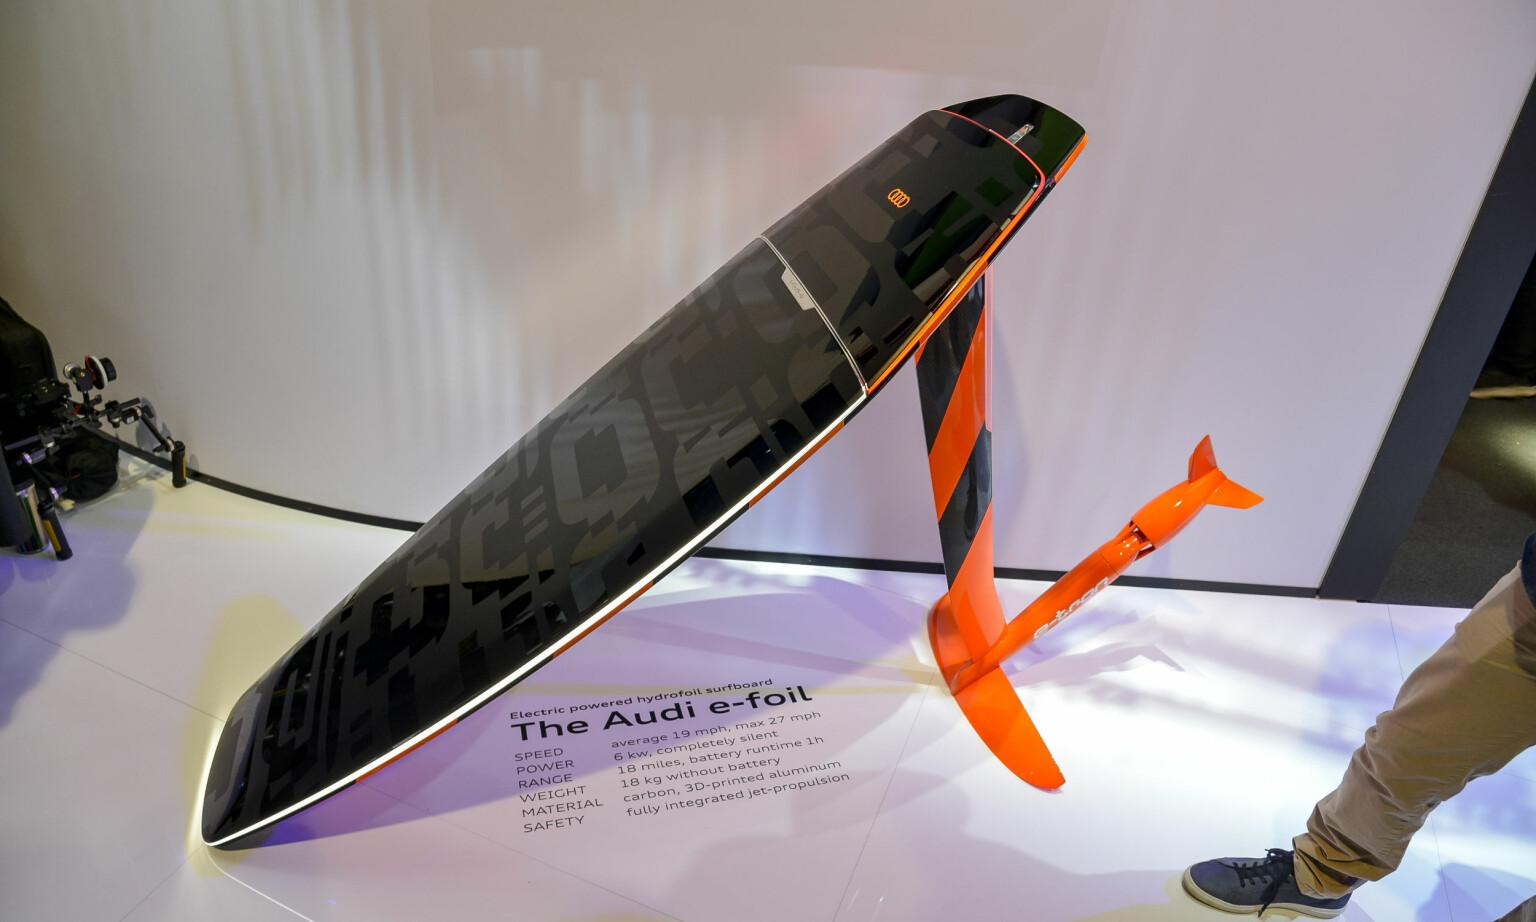 AUDI e-foil: Et elektrisk drevet foilboard, det ultimate tilbehør til din Audi e-Tron. Foto: Jamieson Pothecary.